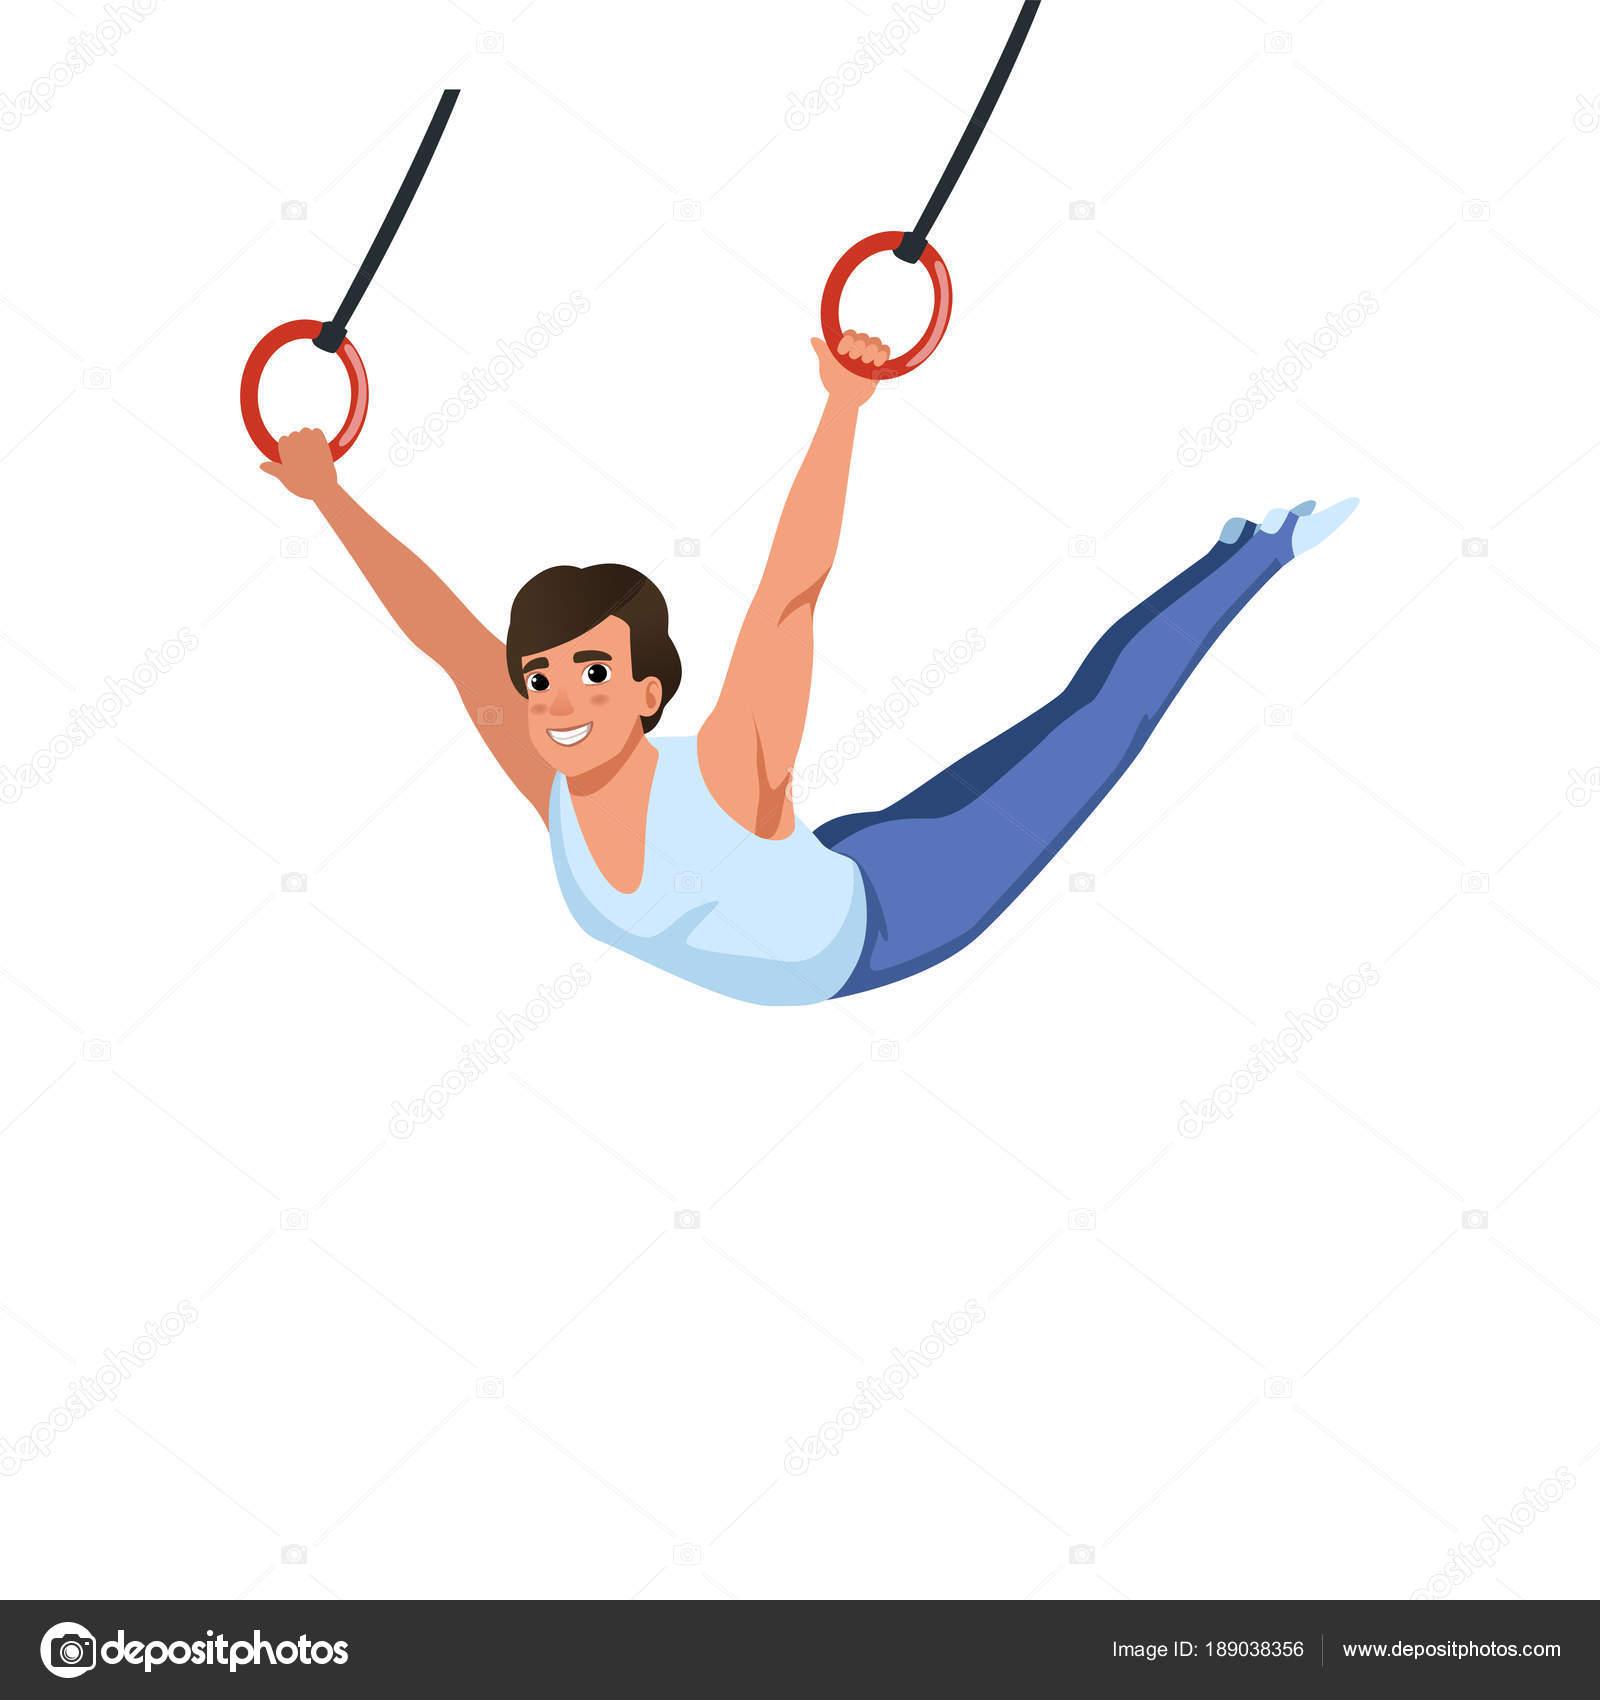 Mlady Kluk Skoleni O Krouzky Pristroje Sportovni Gymnastika